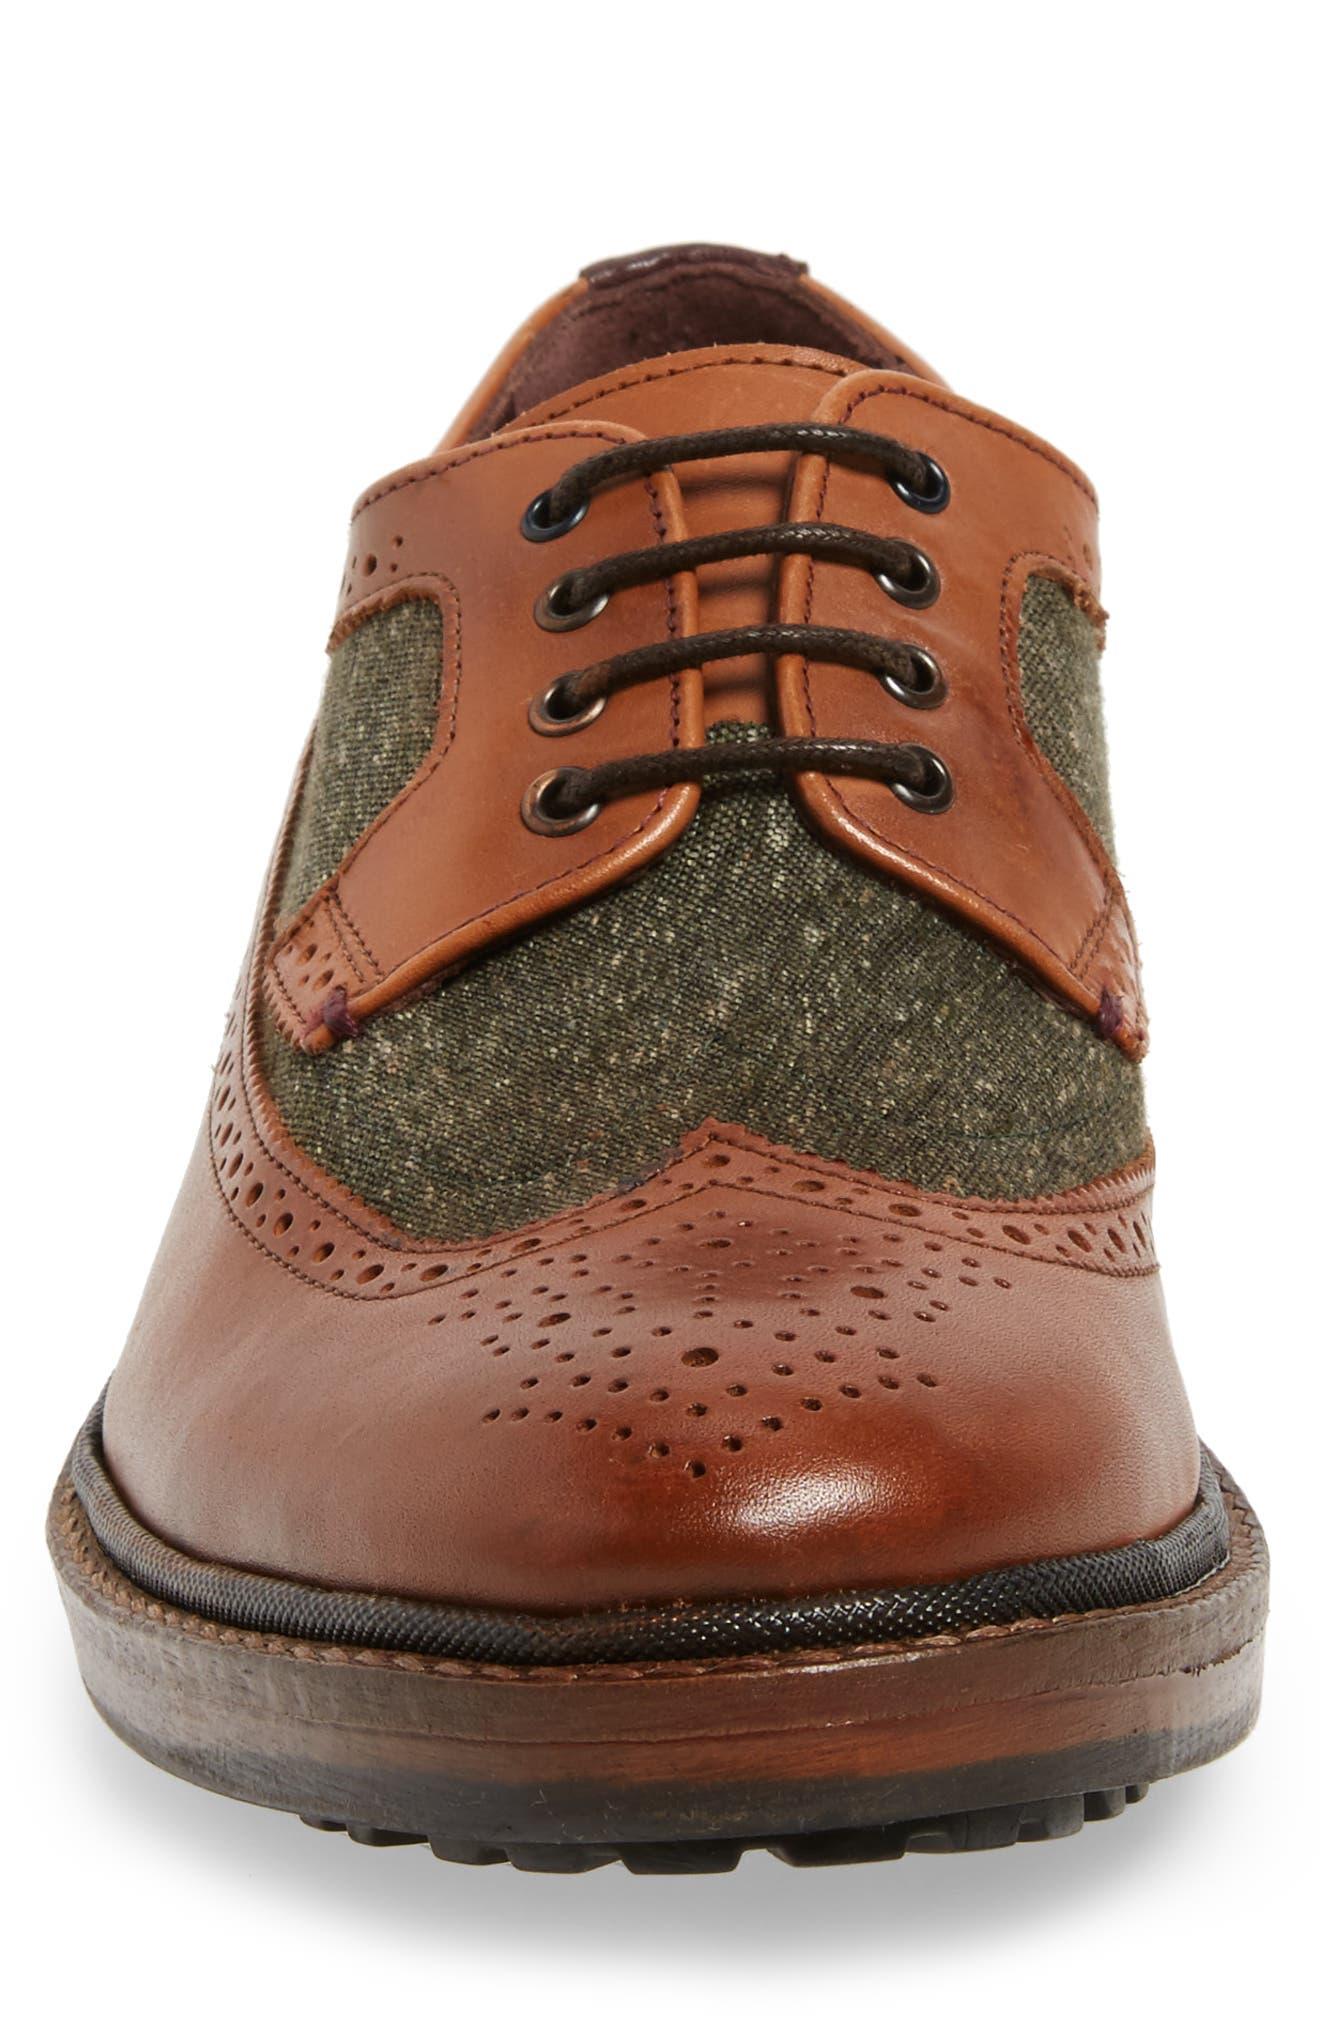 Casbo Spectator Shoe,                             Alternate thumbnail 4, color,                             Tan Multi Leather